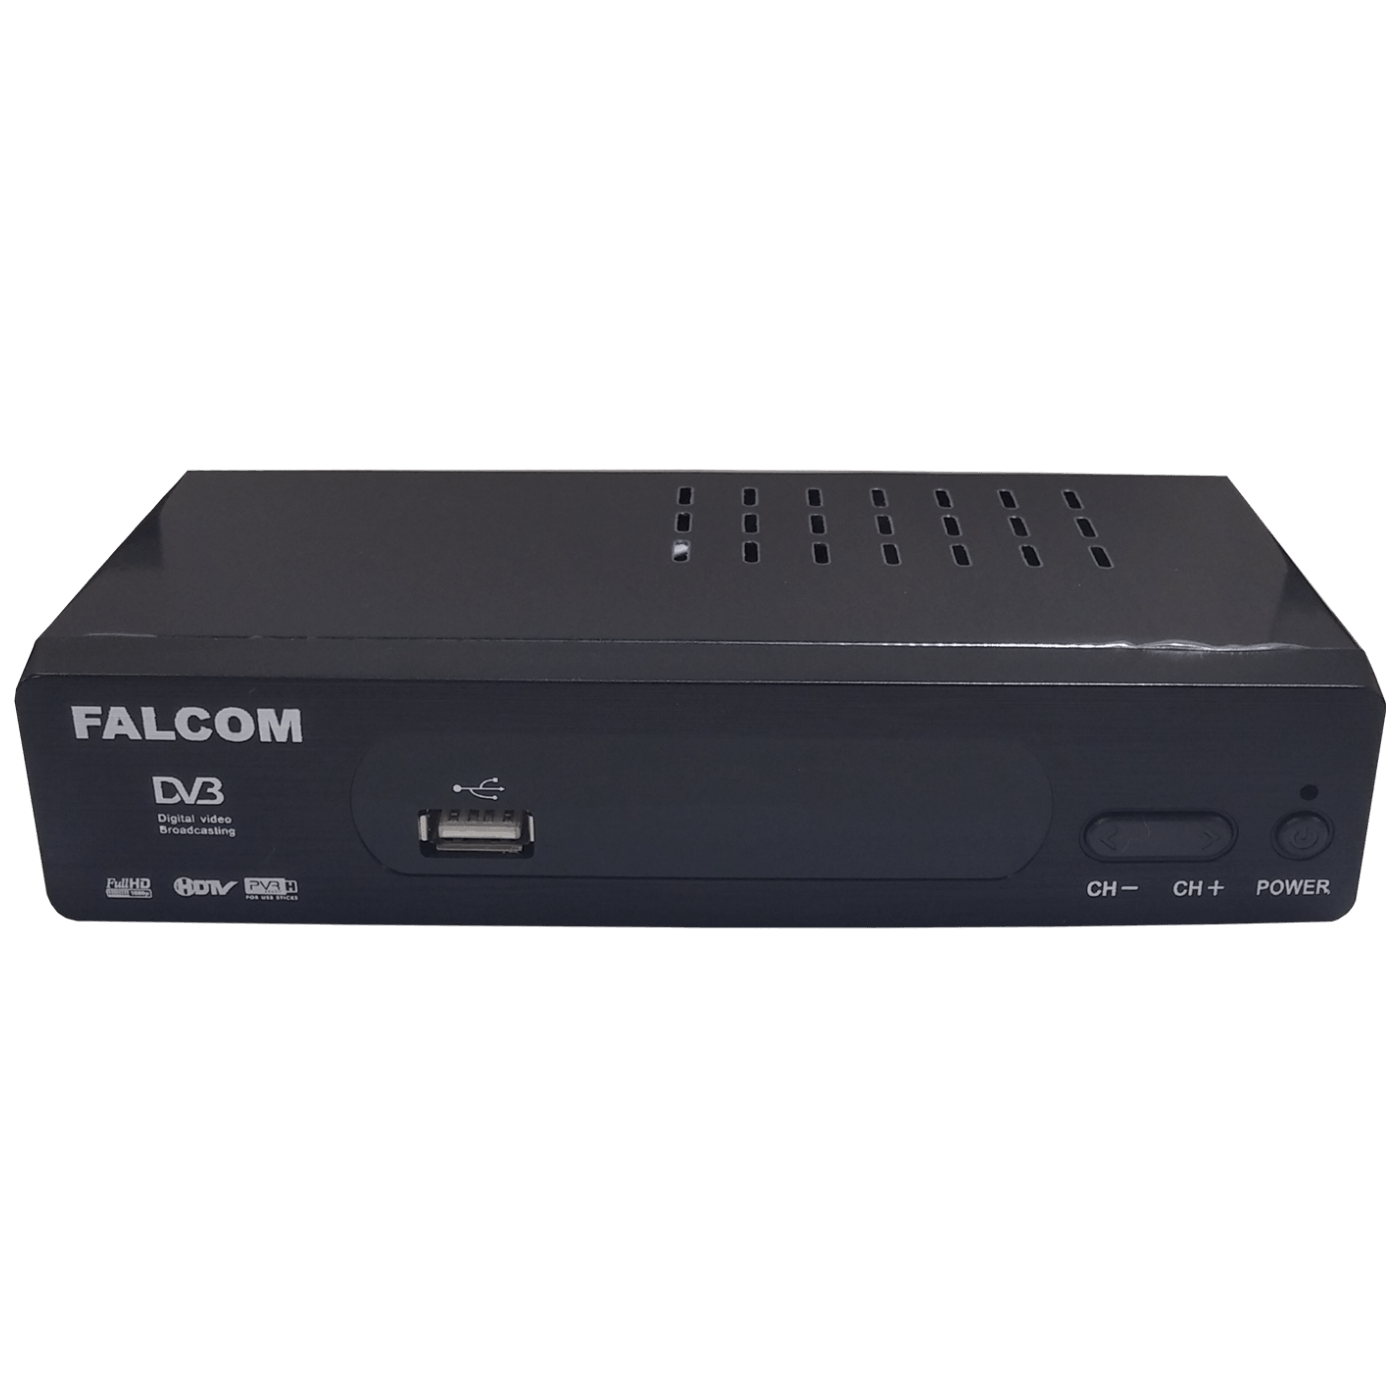 Falcom - T1400+